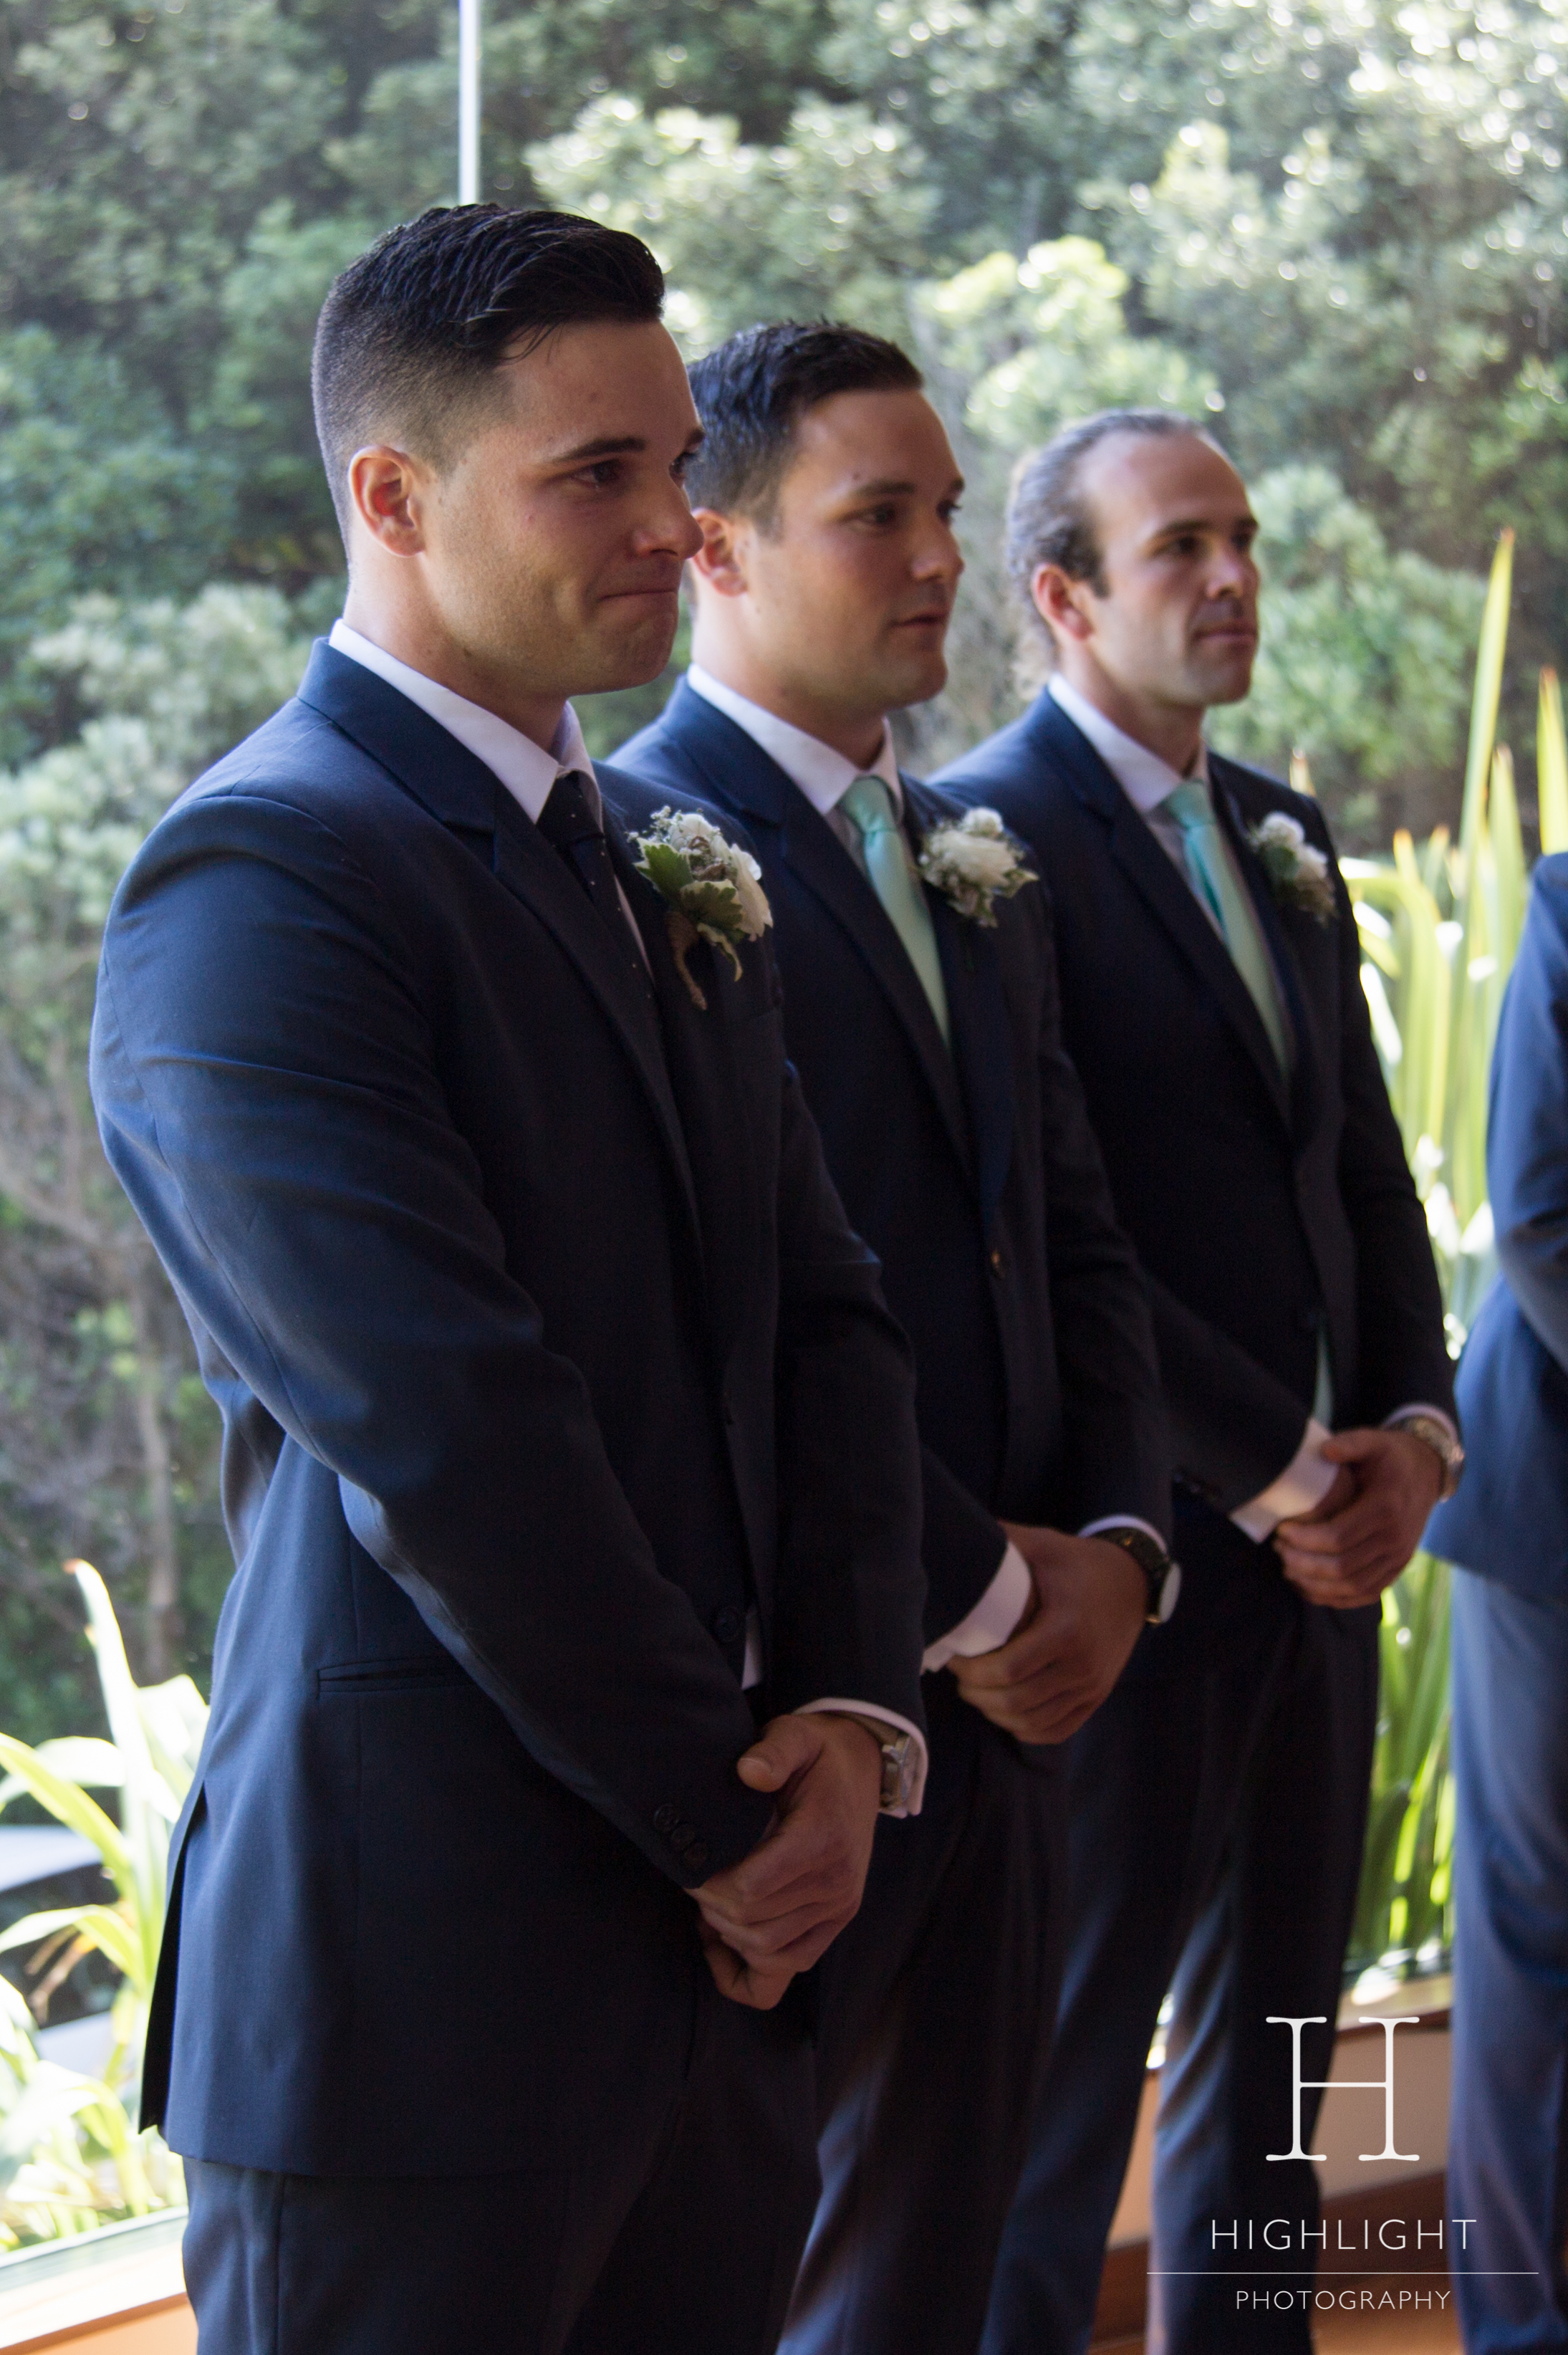 highlight_photography_wedding_new_zealand_cormac.jpg